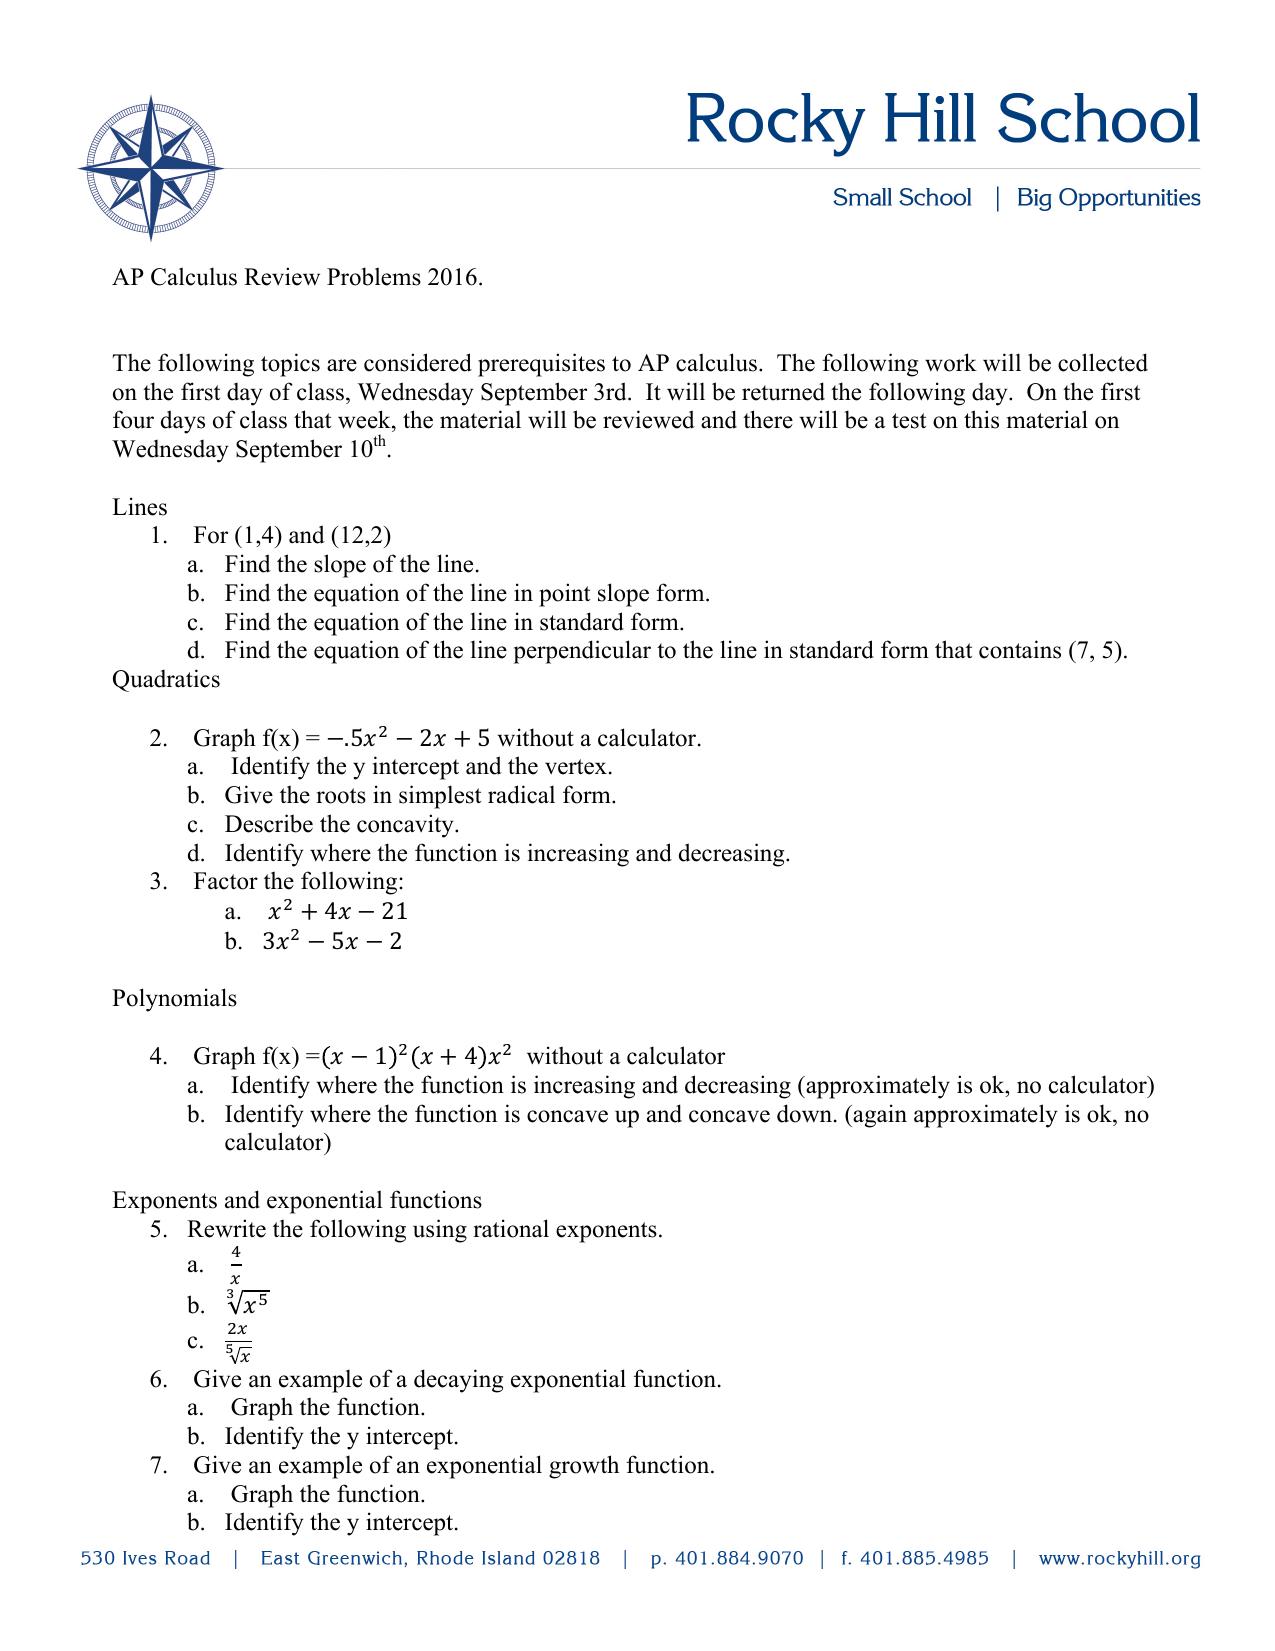 AP Calculus - Rocky Hill School